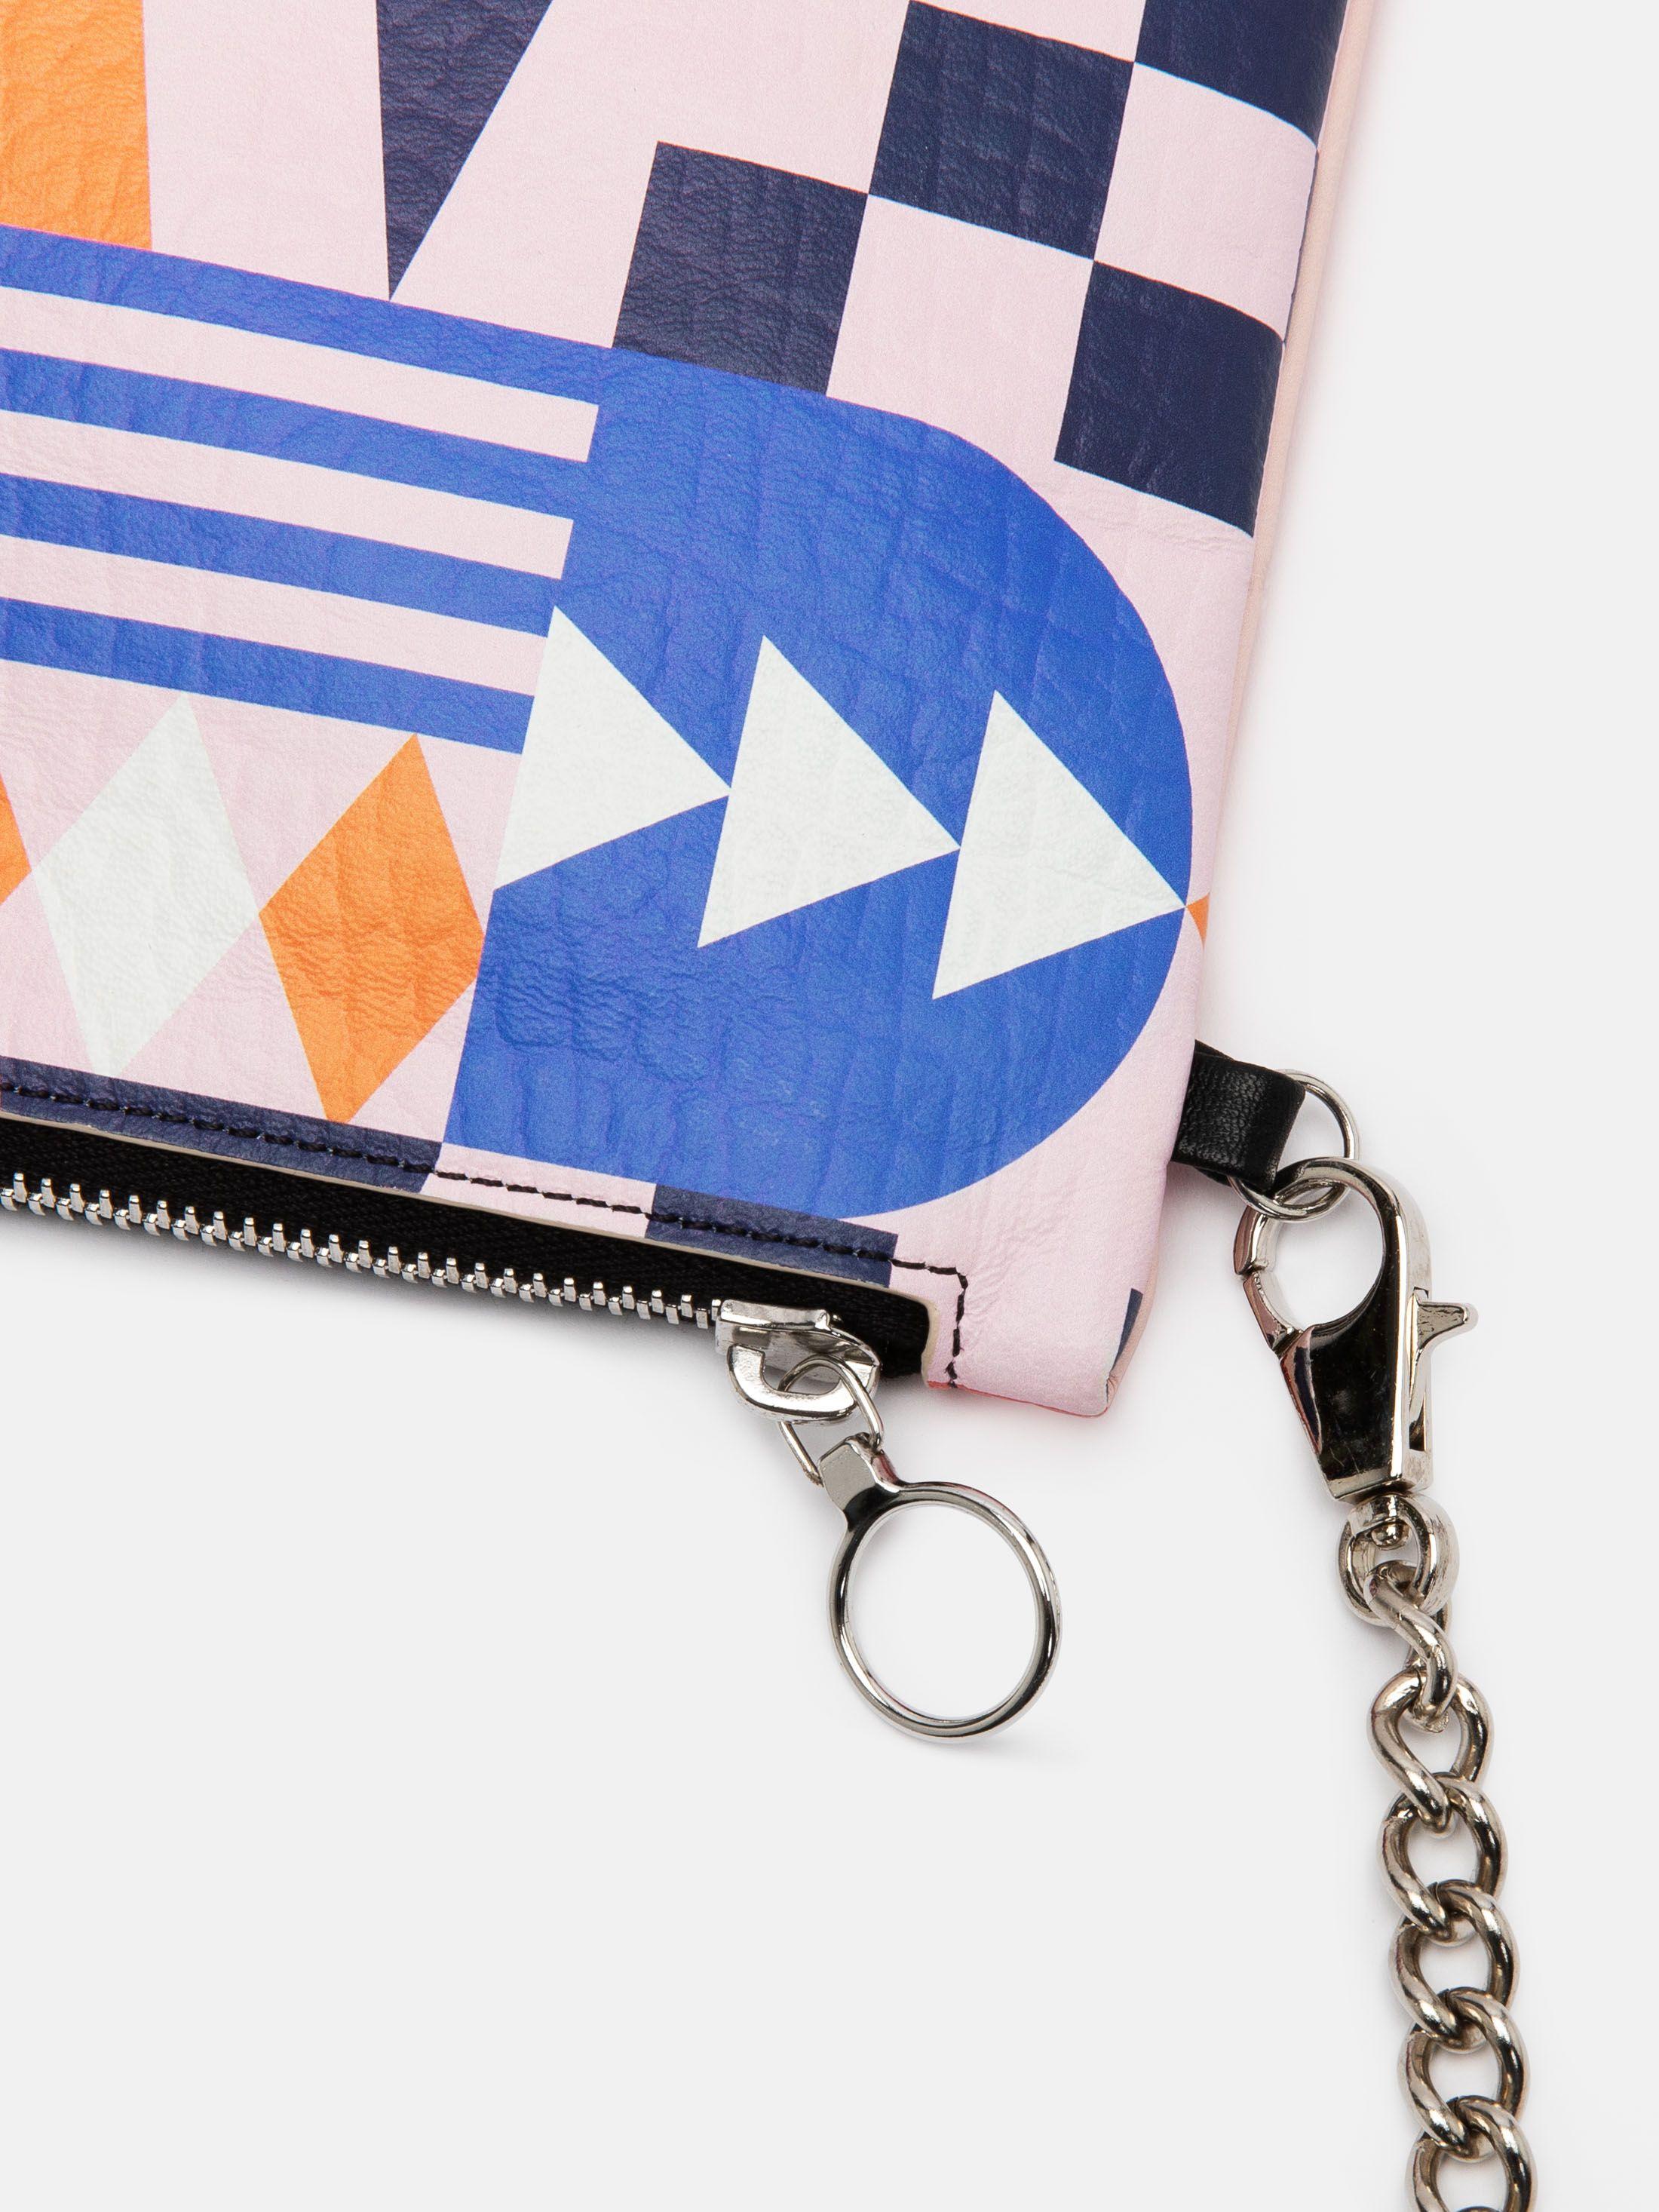 Custom printed Leather Crossbody Bag